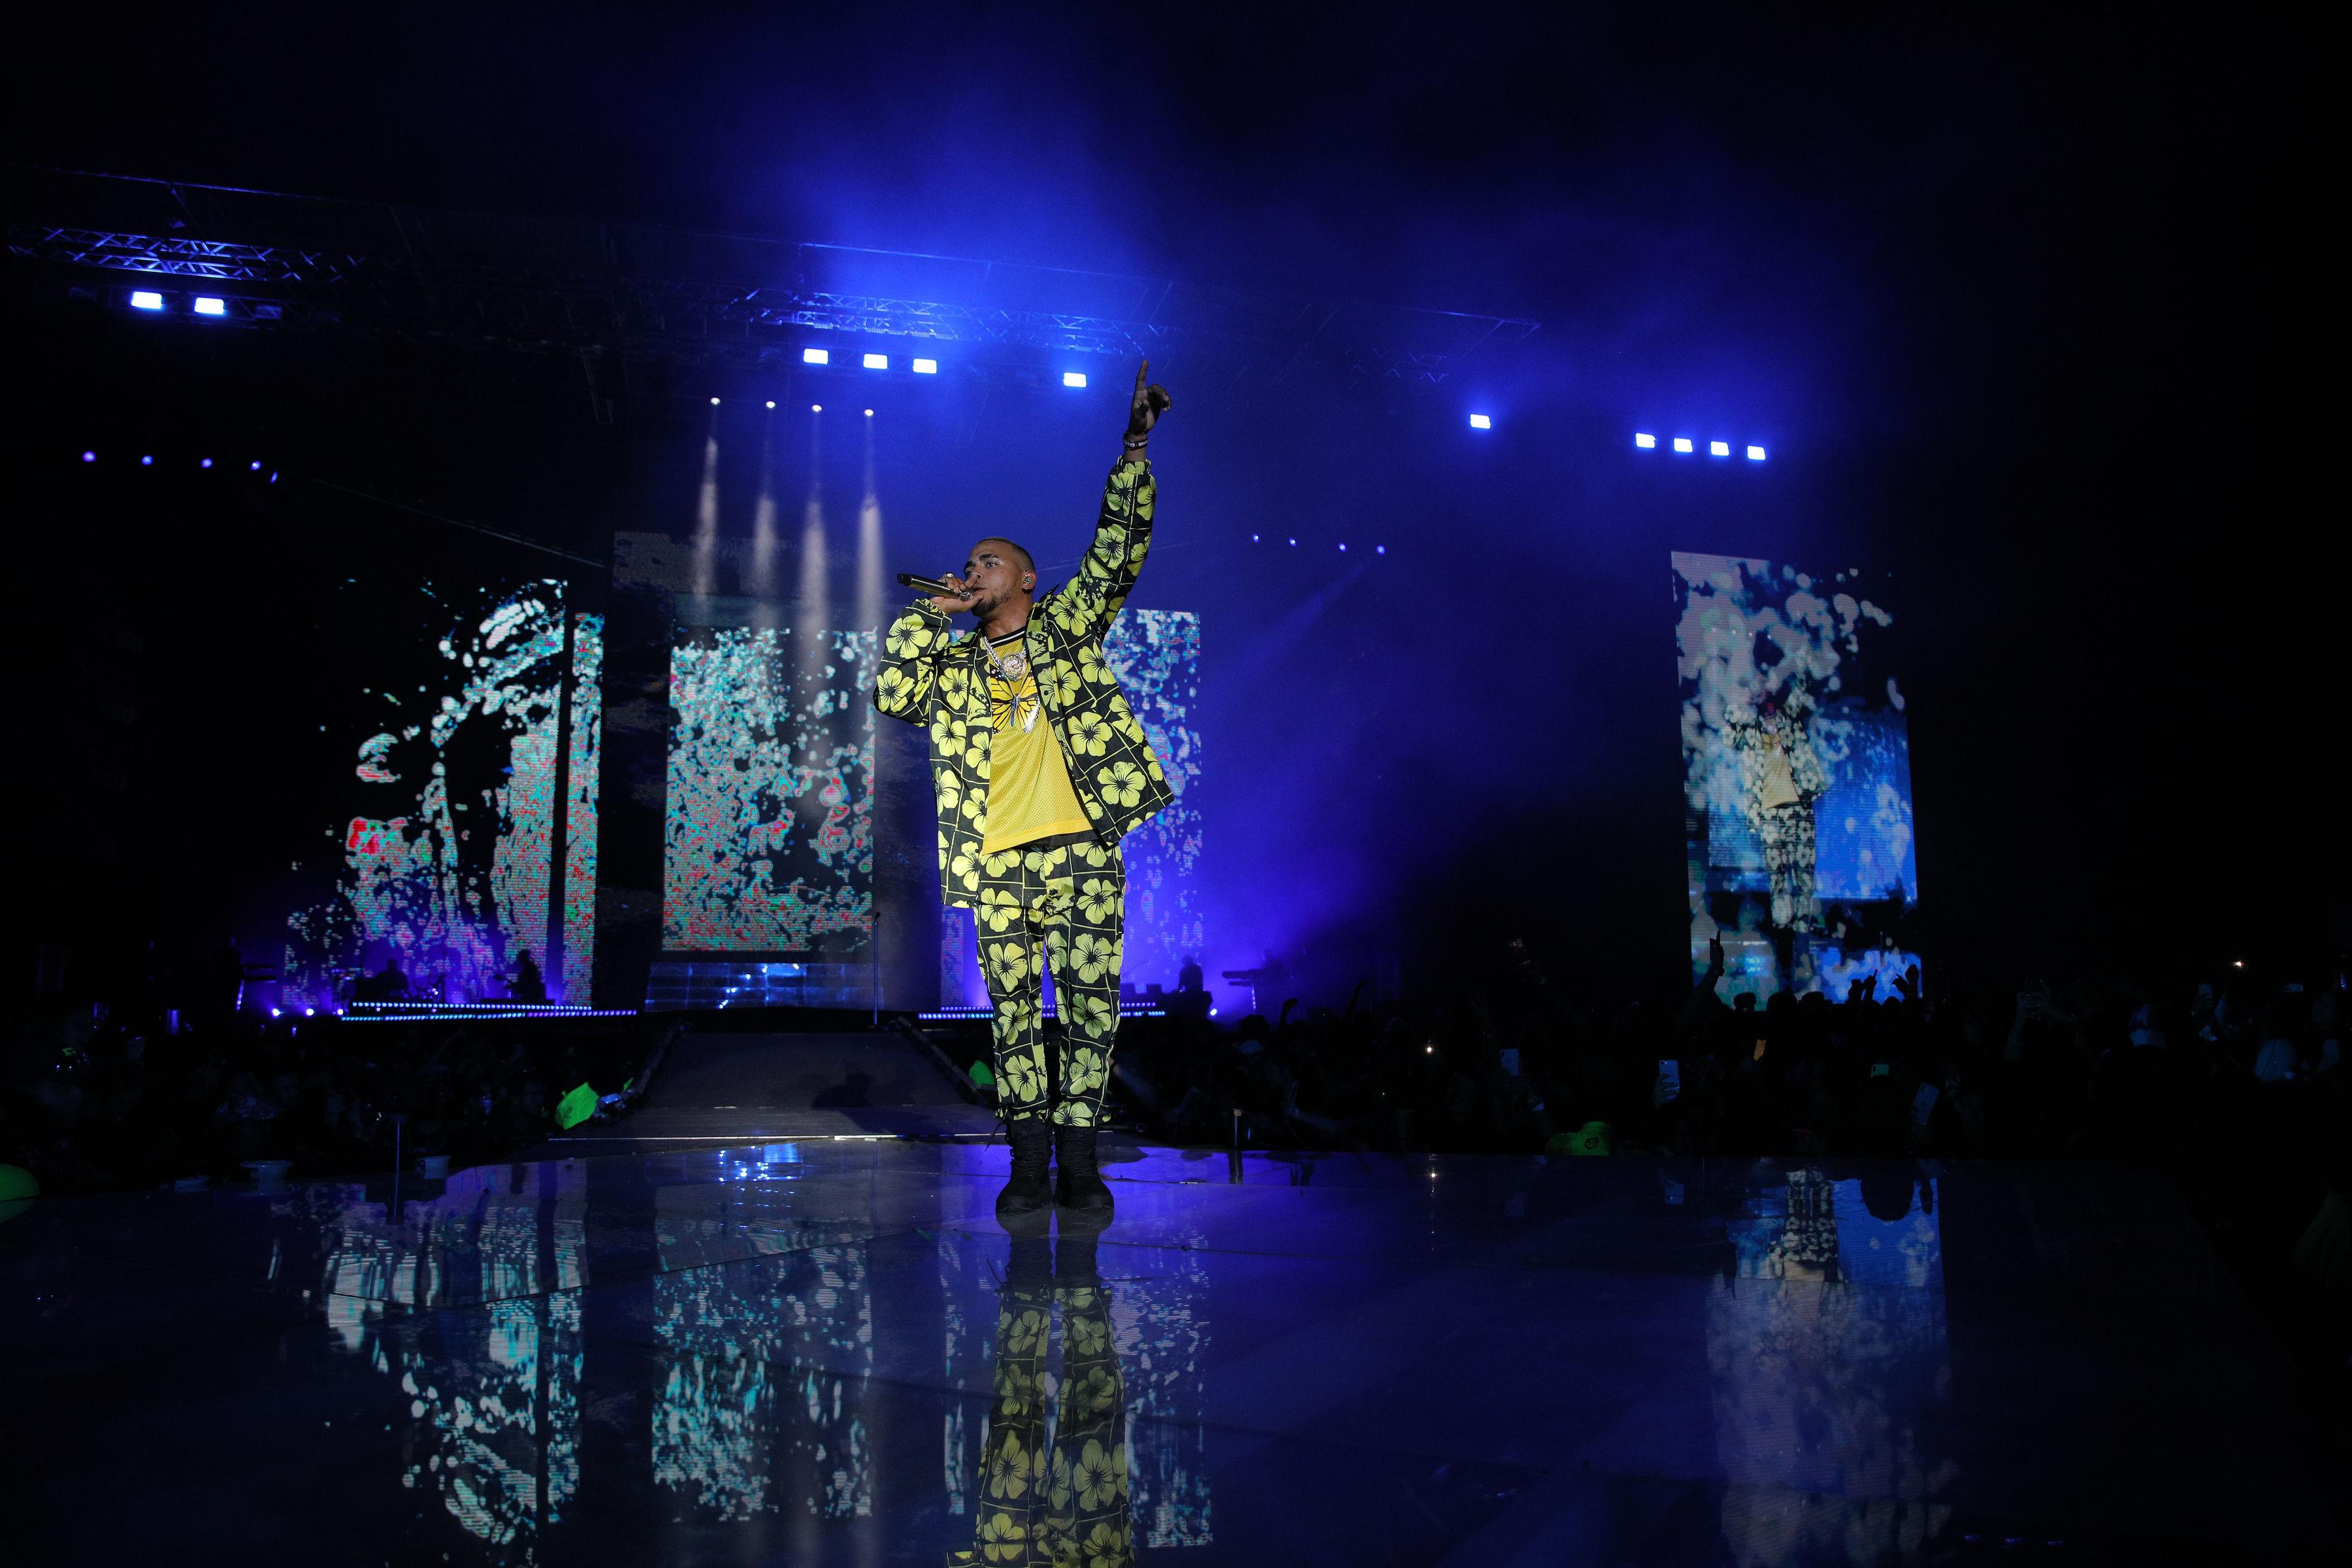 Ozuna Kicks off His 'Nibiru' World Tour With a Stellar Performance in the Dominican Republic